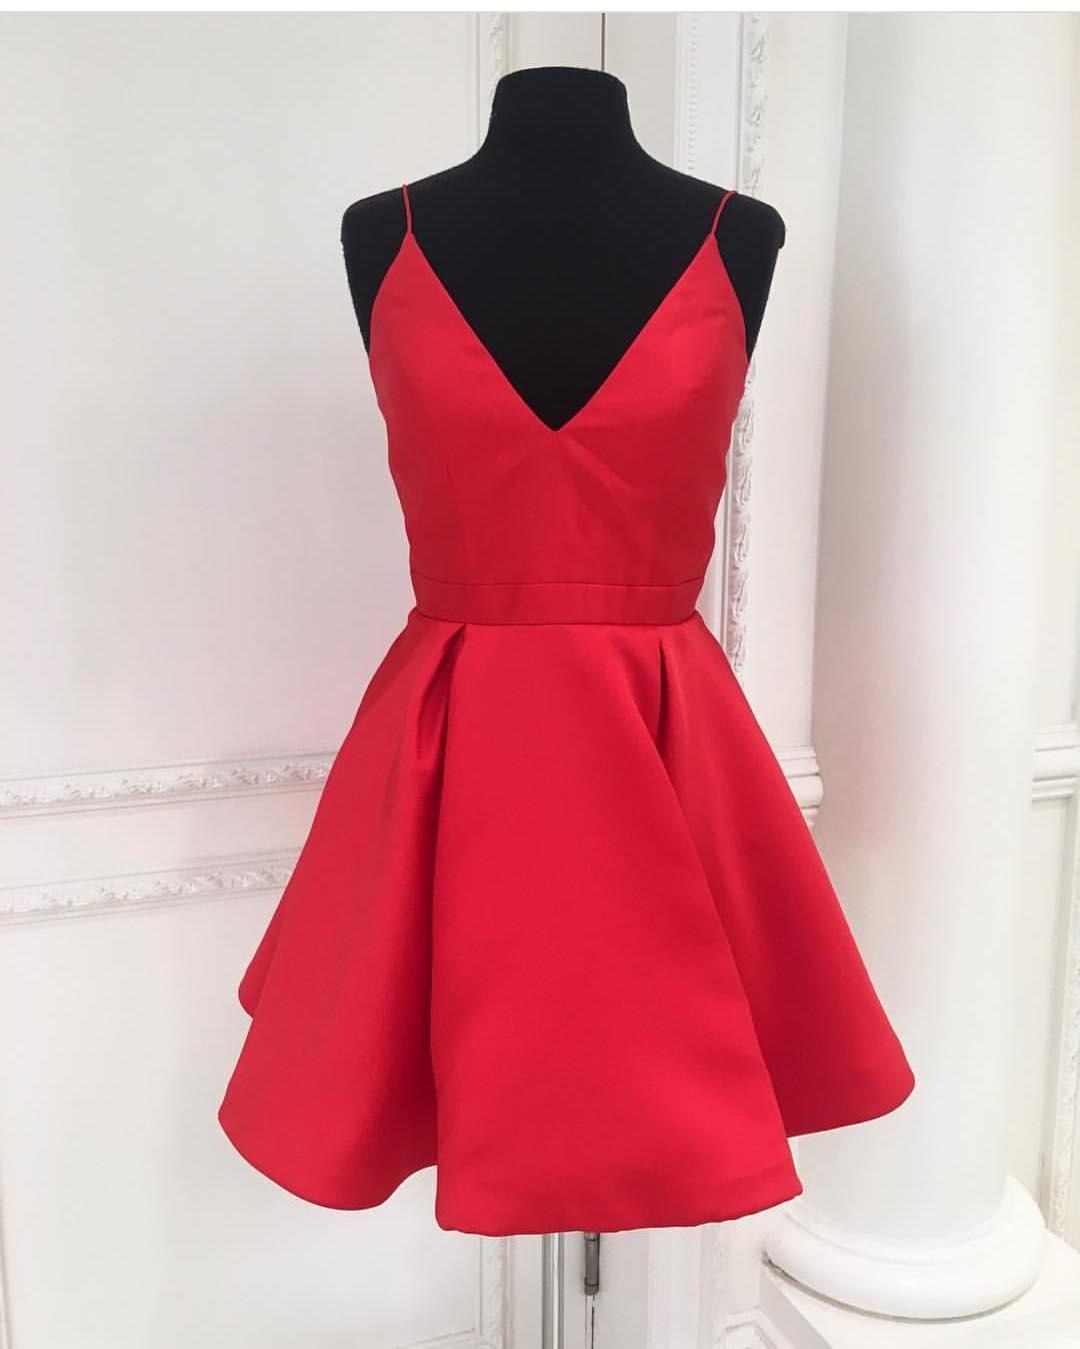 Mini red short prom dress,homecoming dress,cocktail dress · Dreamy ...